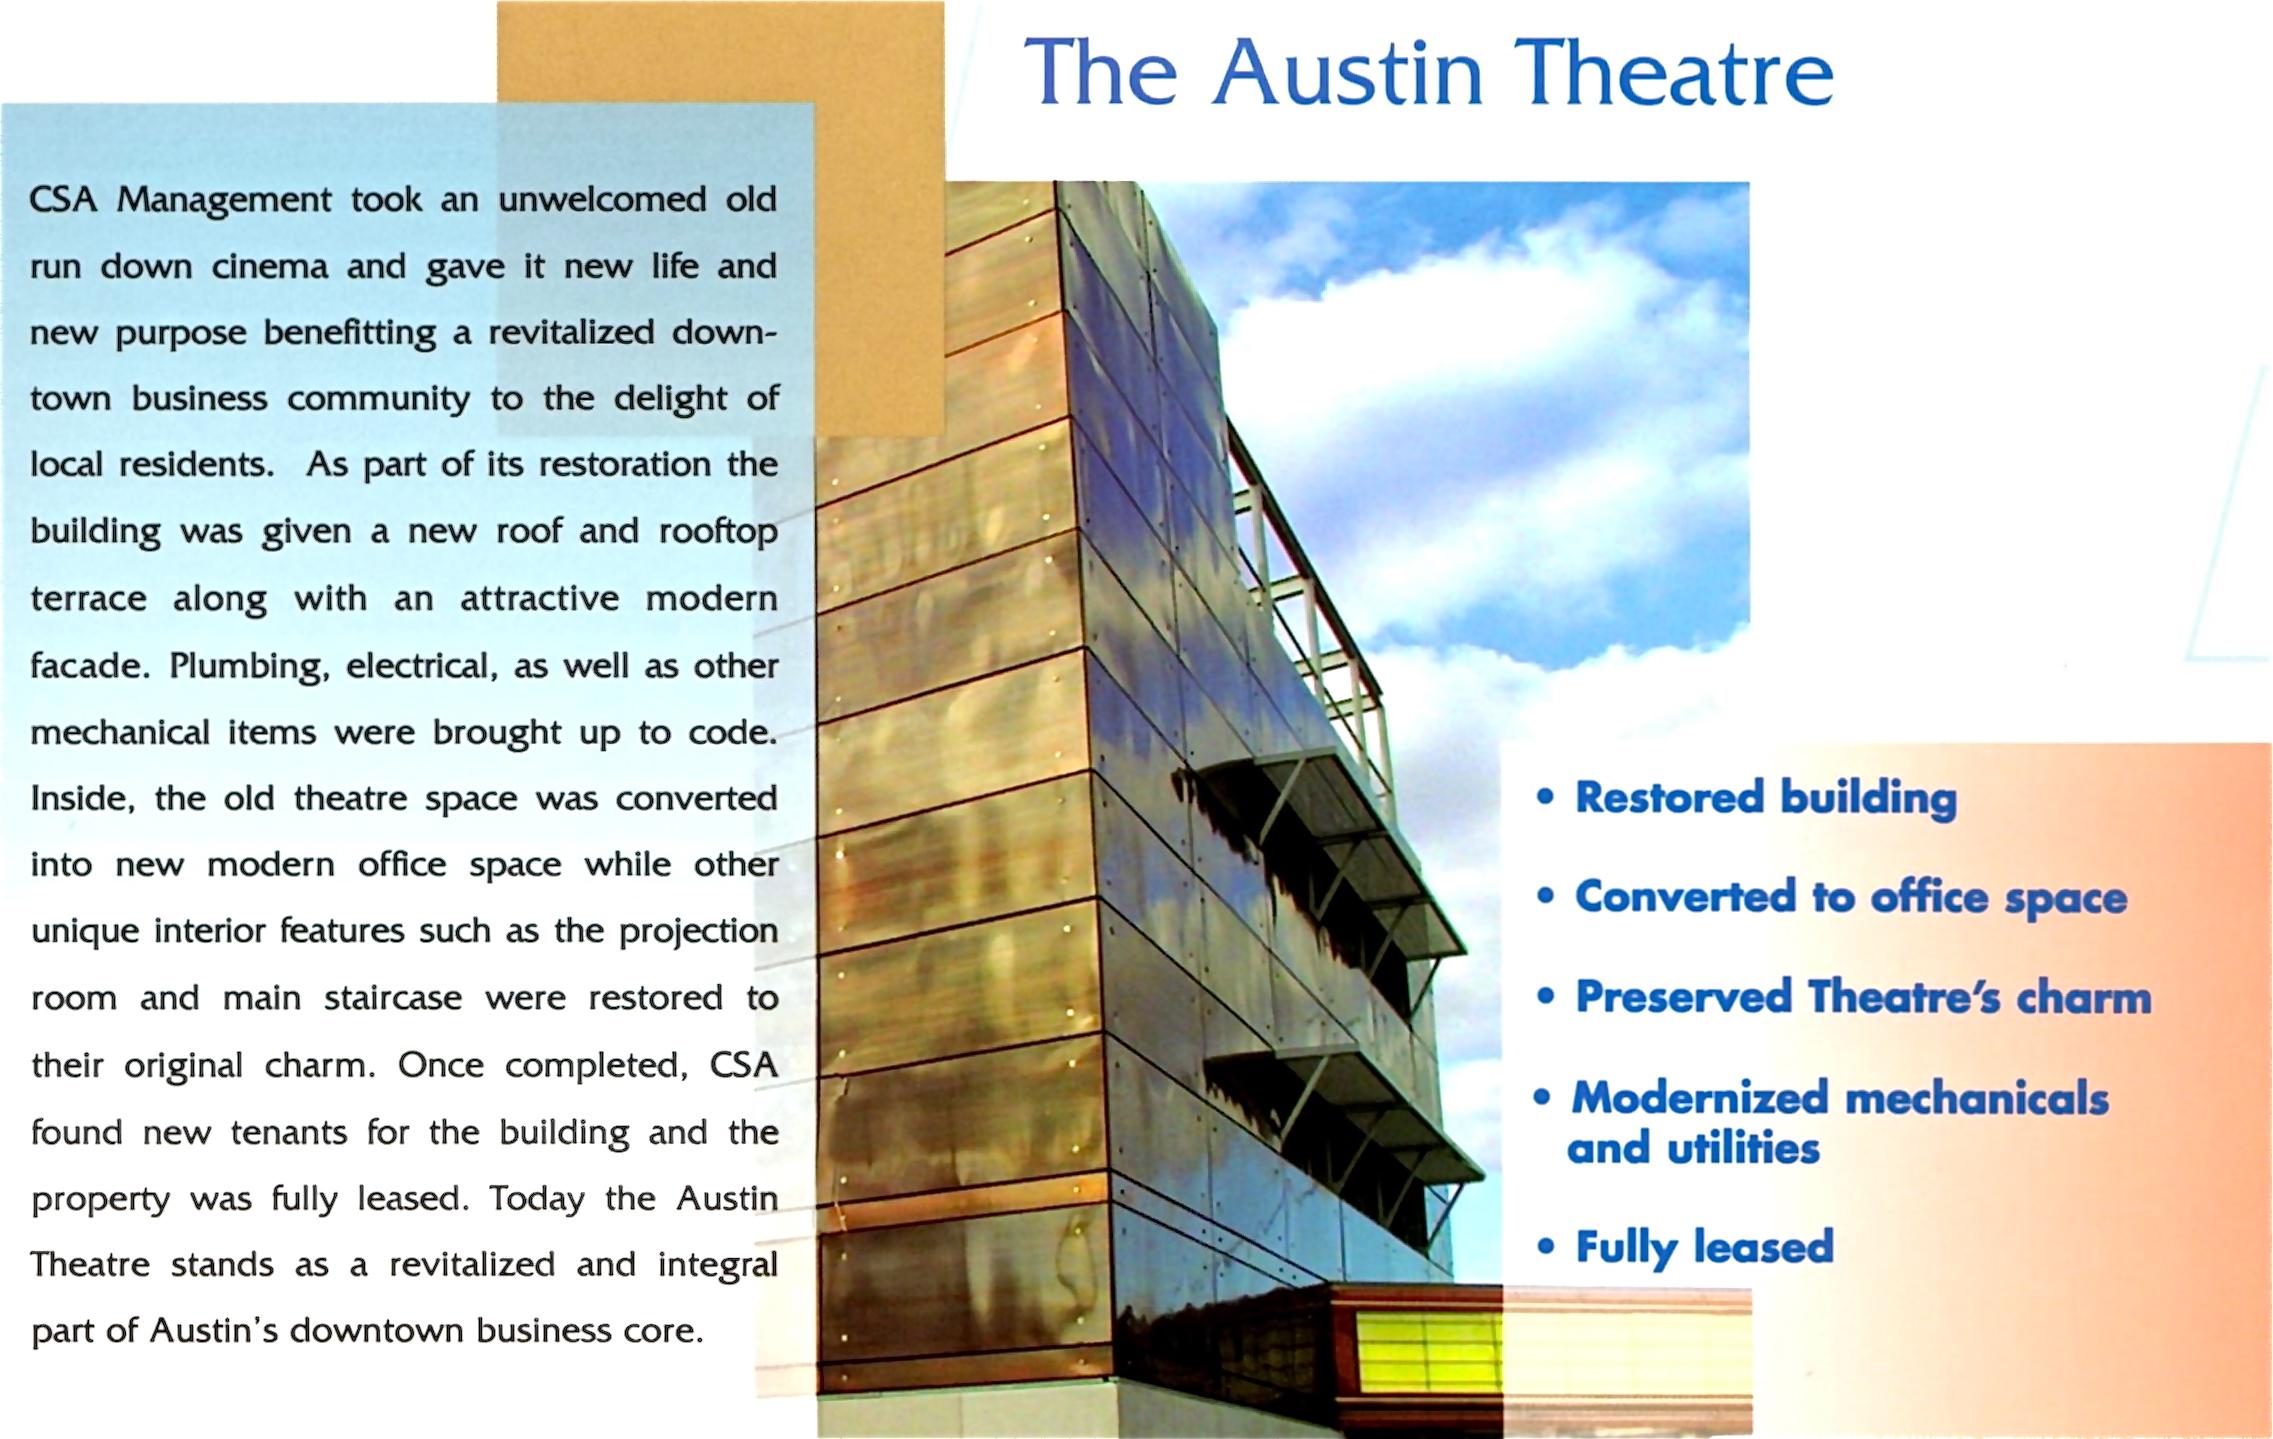 The_Austin_Theatre